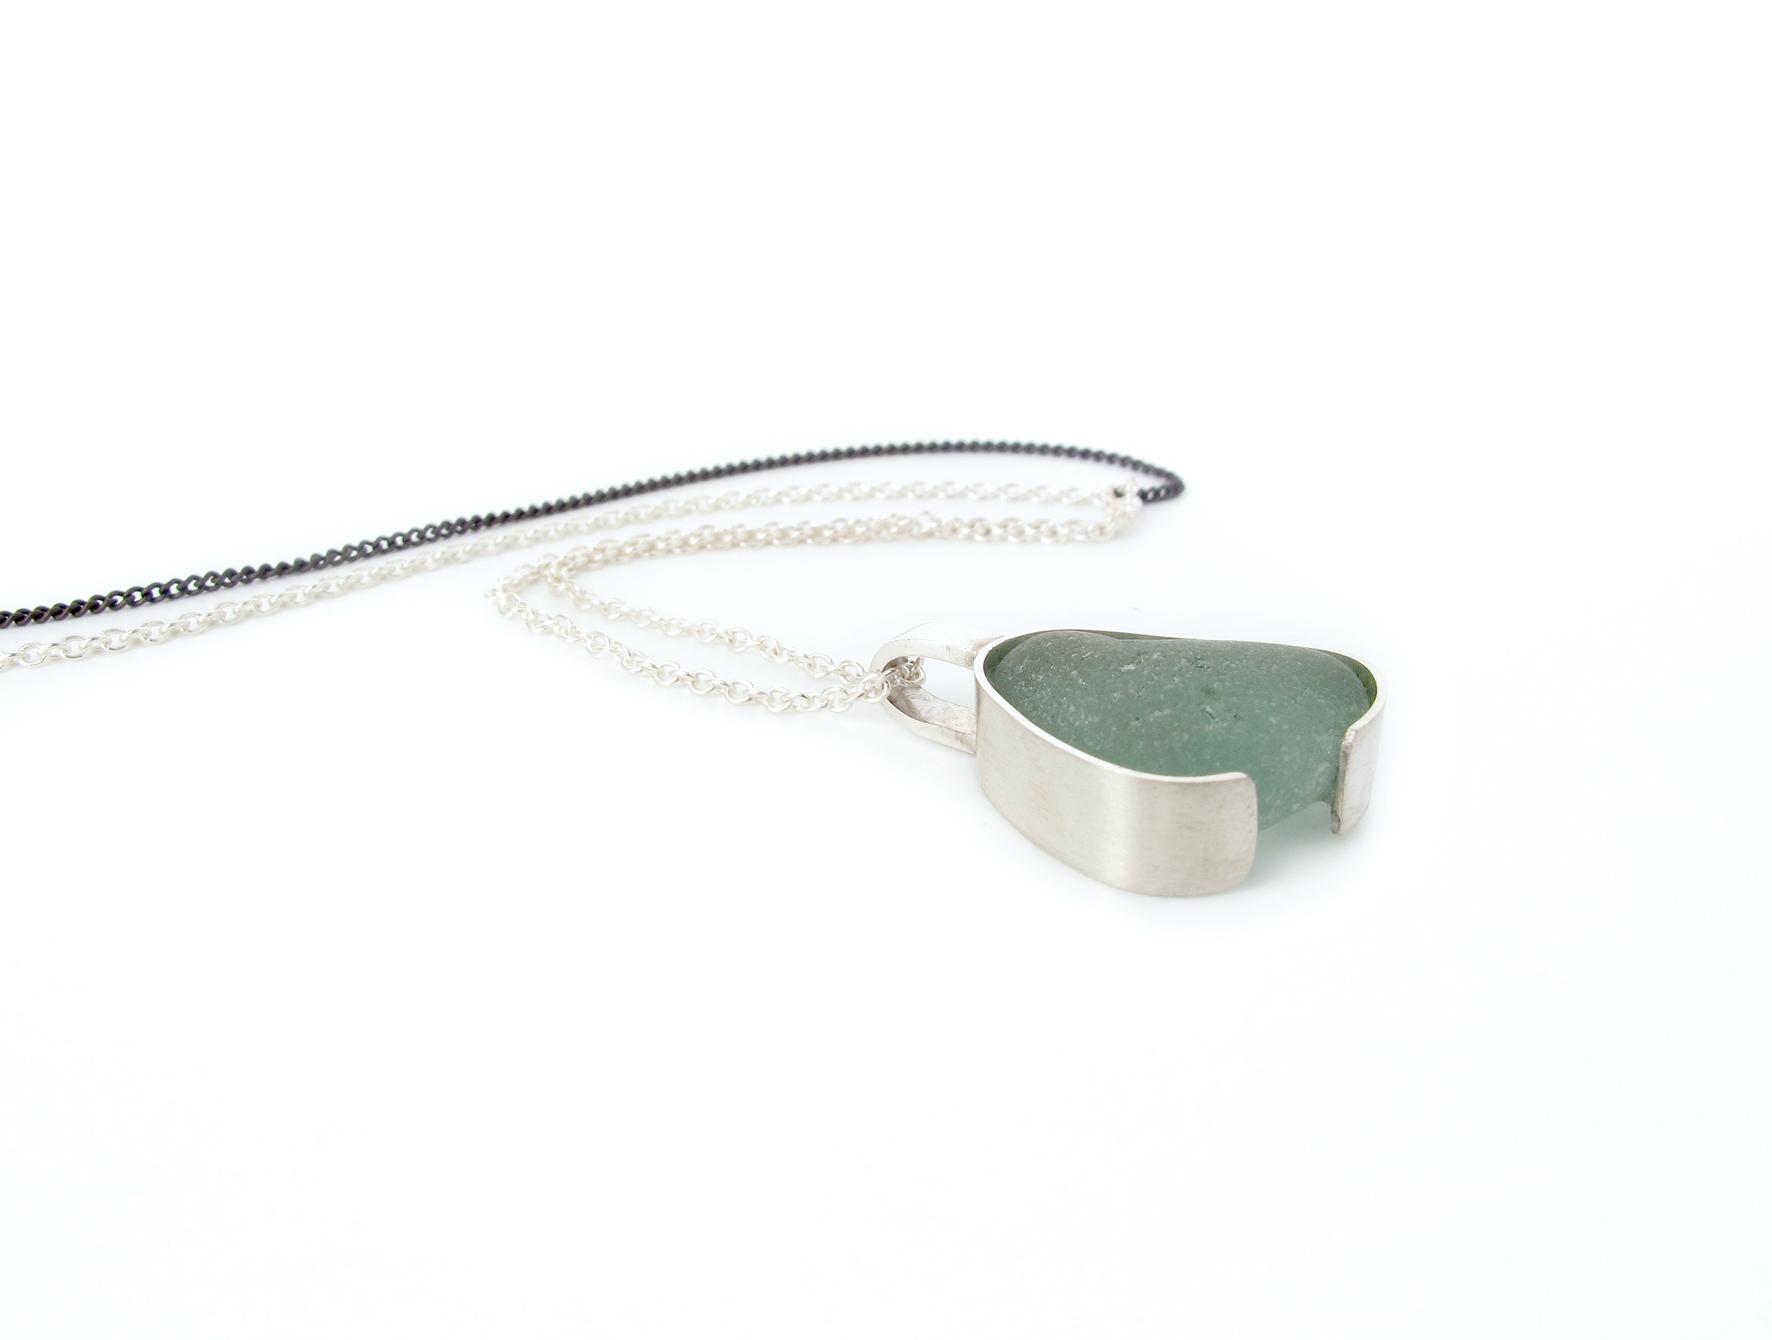 seafoam beach glass necklace 4.jpg